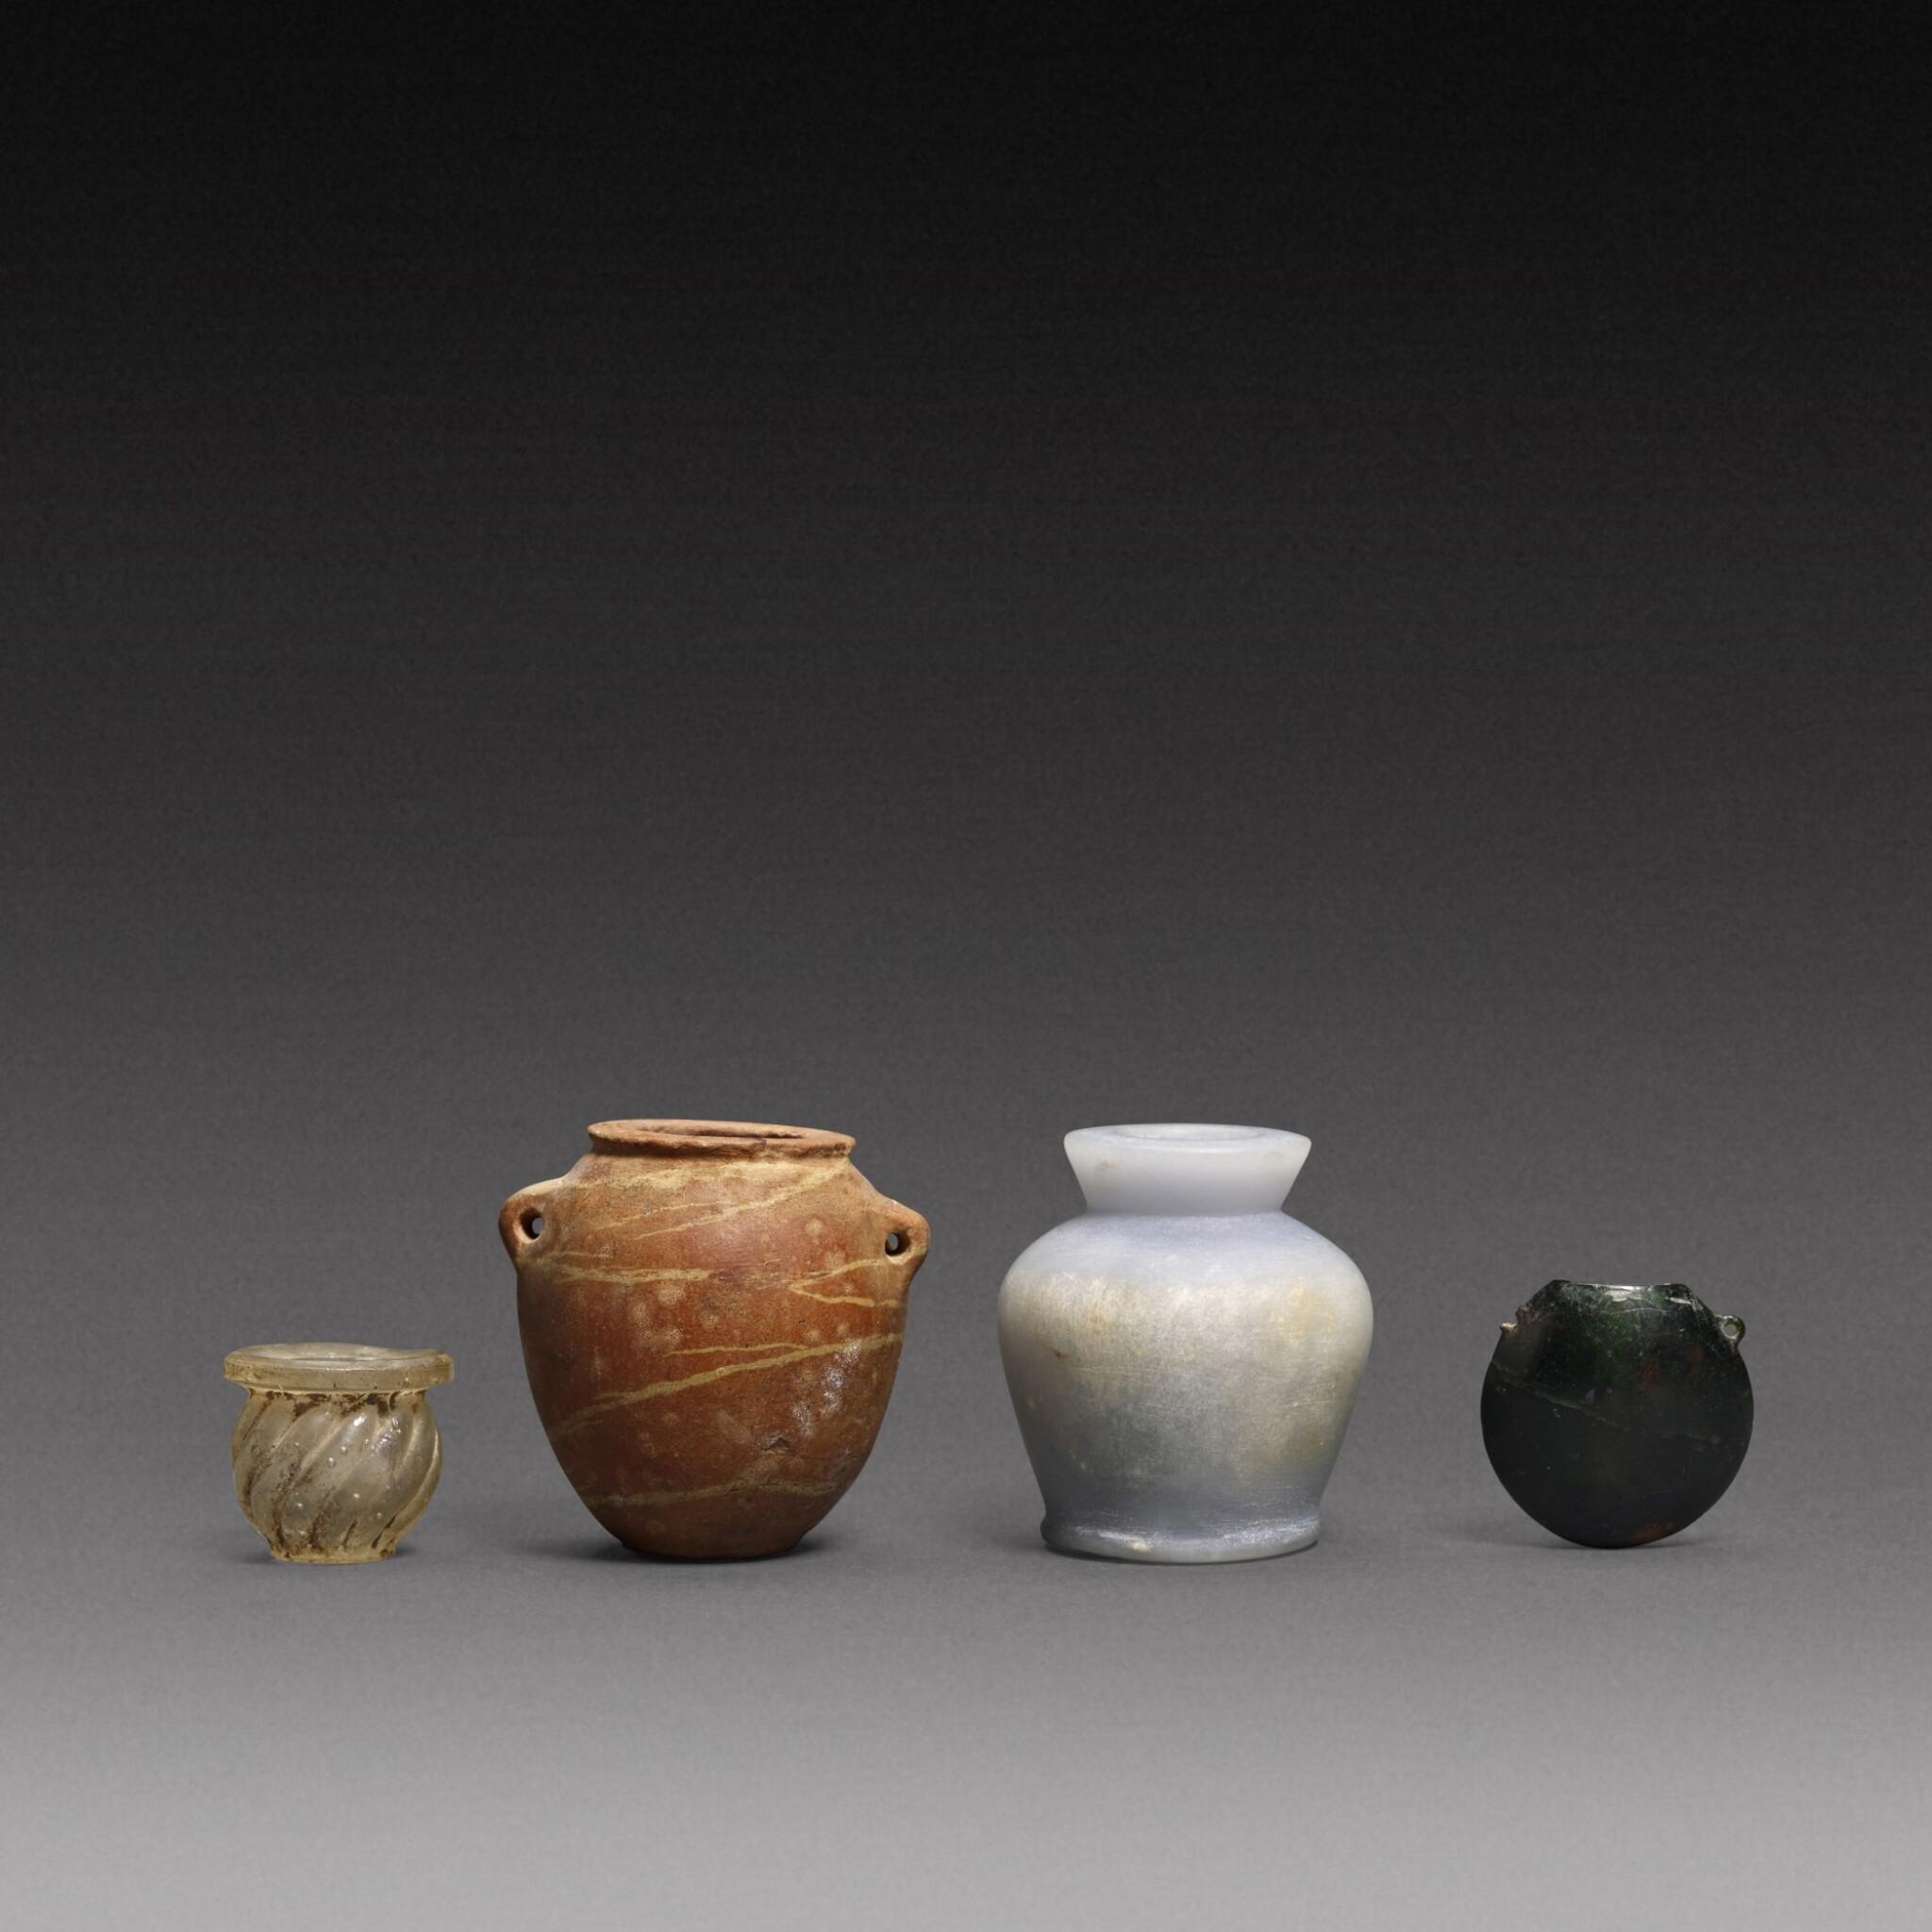 View full screen - View 1 of Lot 70. Four Miniature Vessels, circa 4th millennium B.C./1st Millennium A.D..